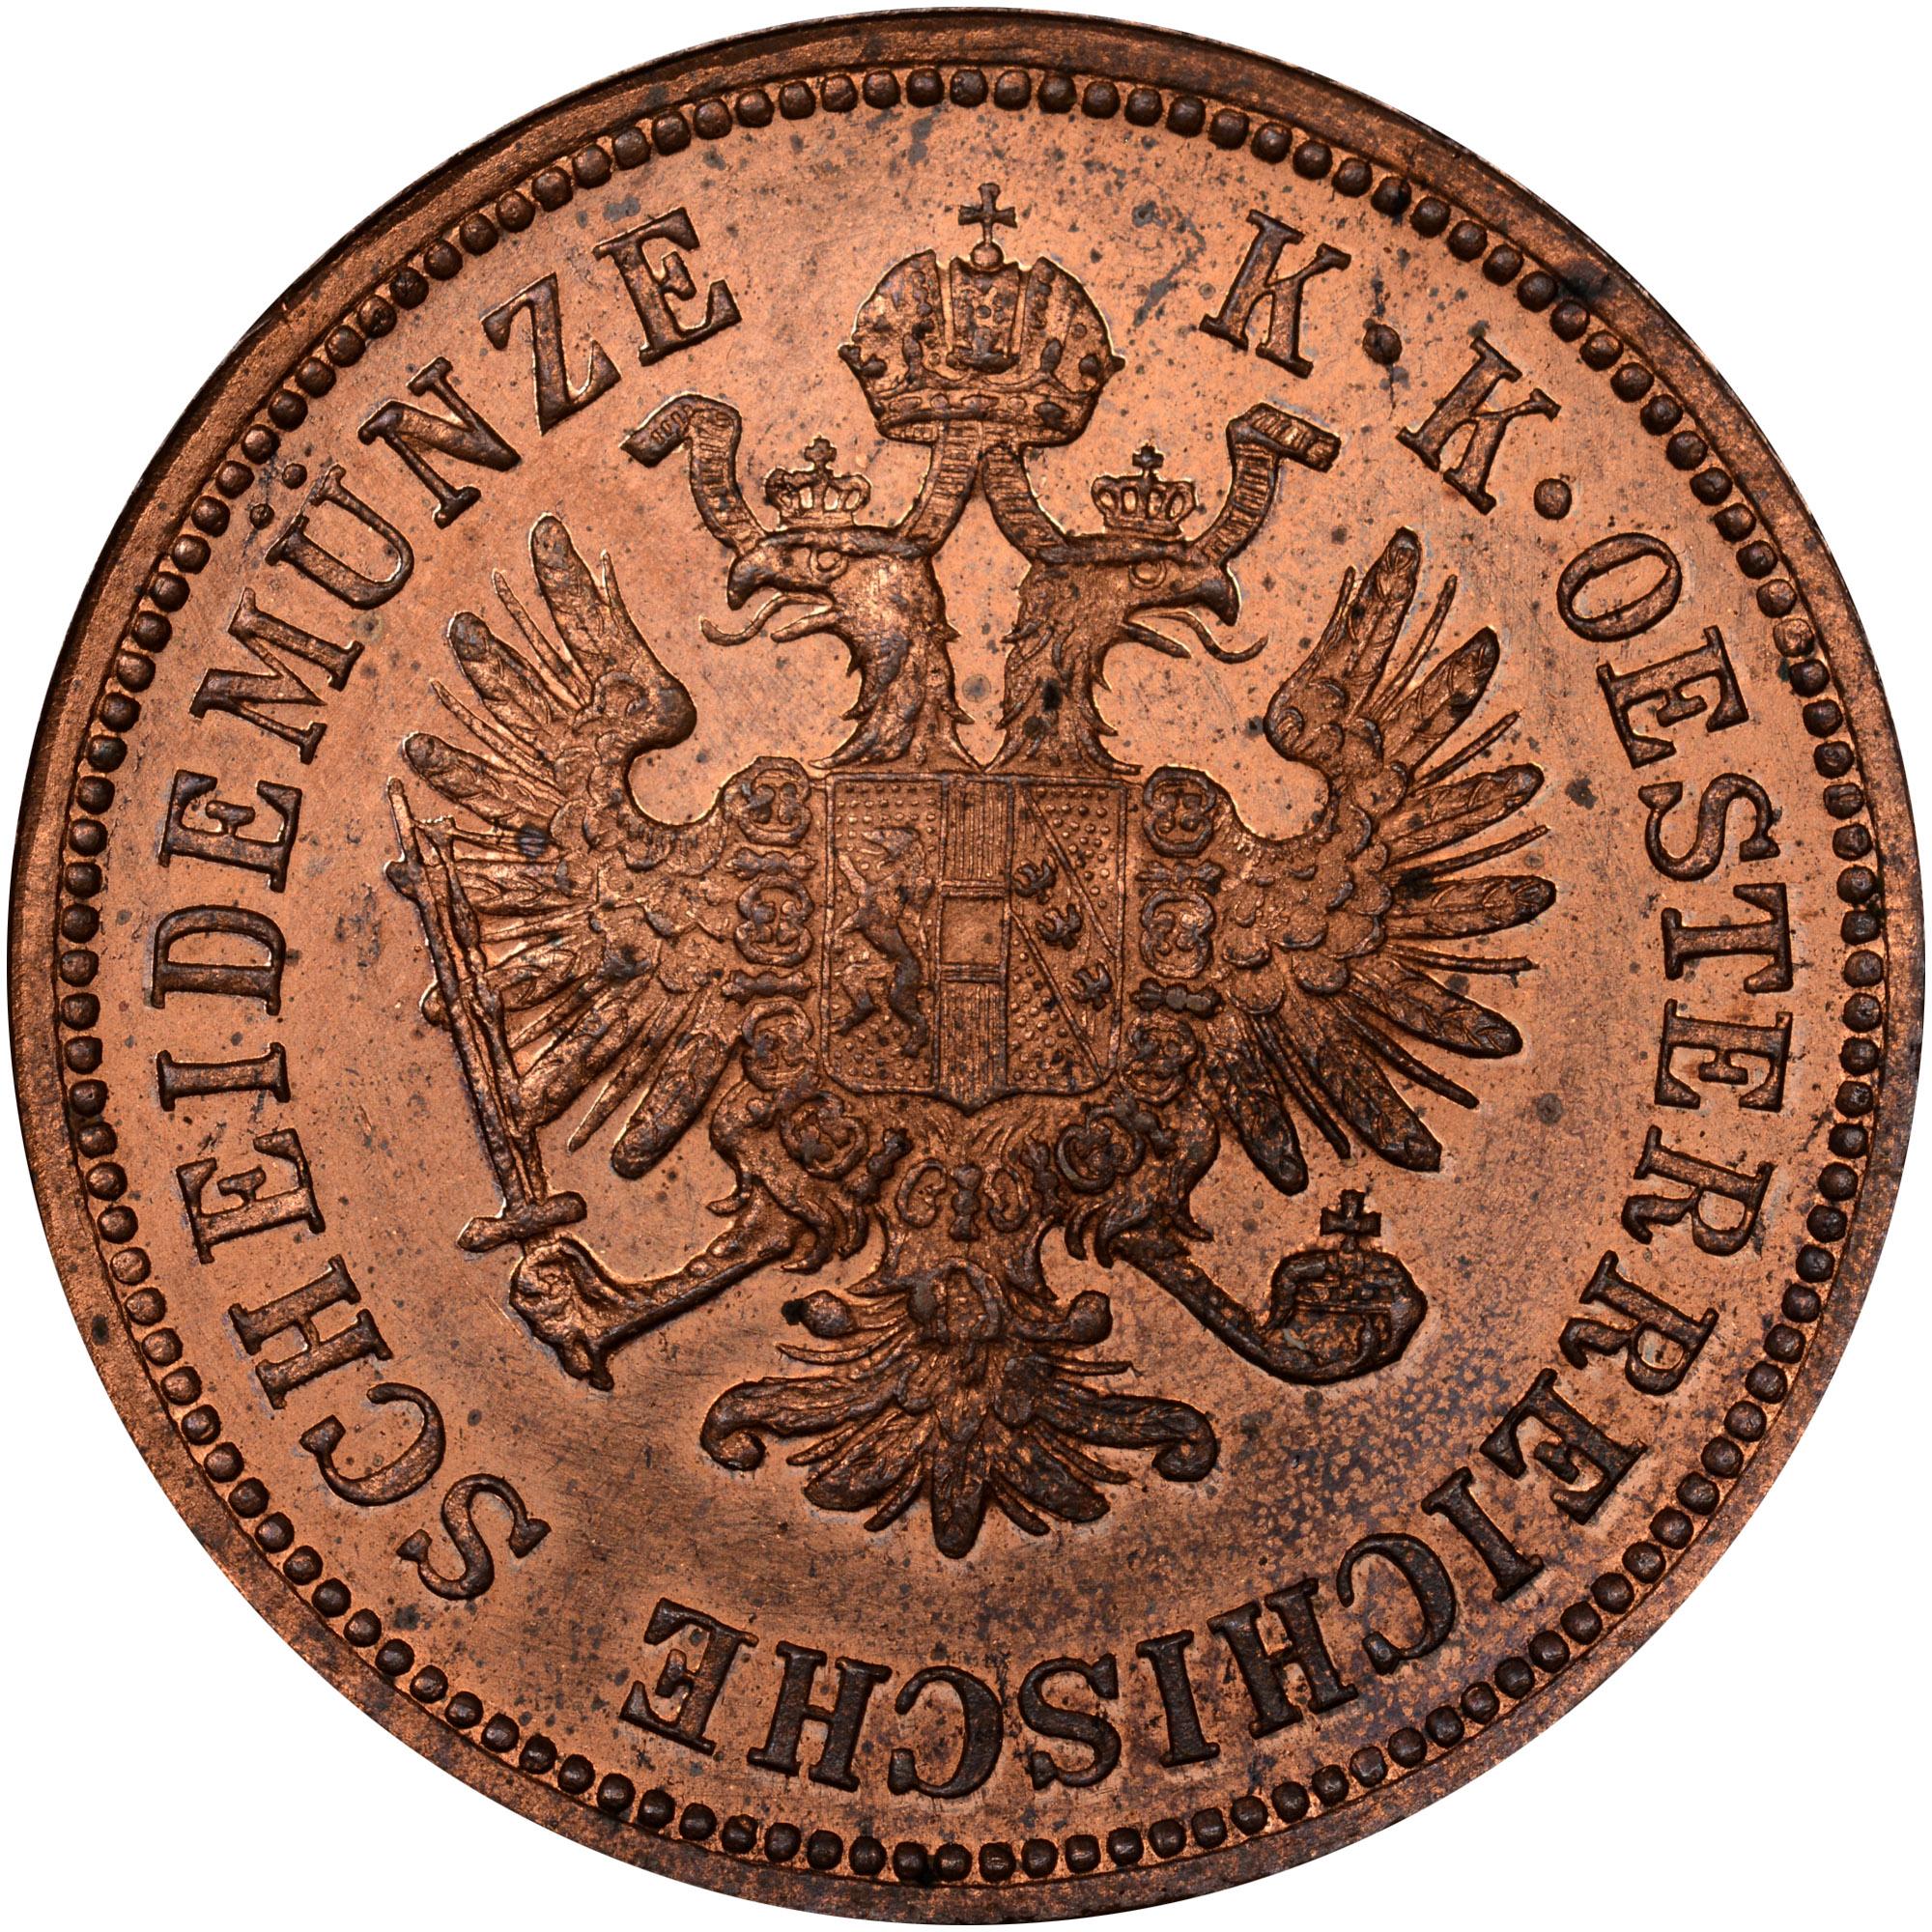 1860-1864 Austria 4 Kreuzer obverse